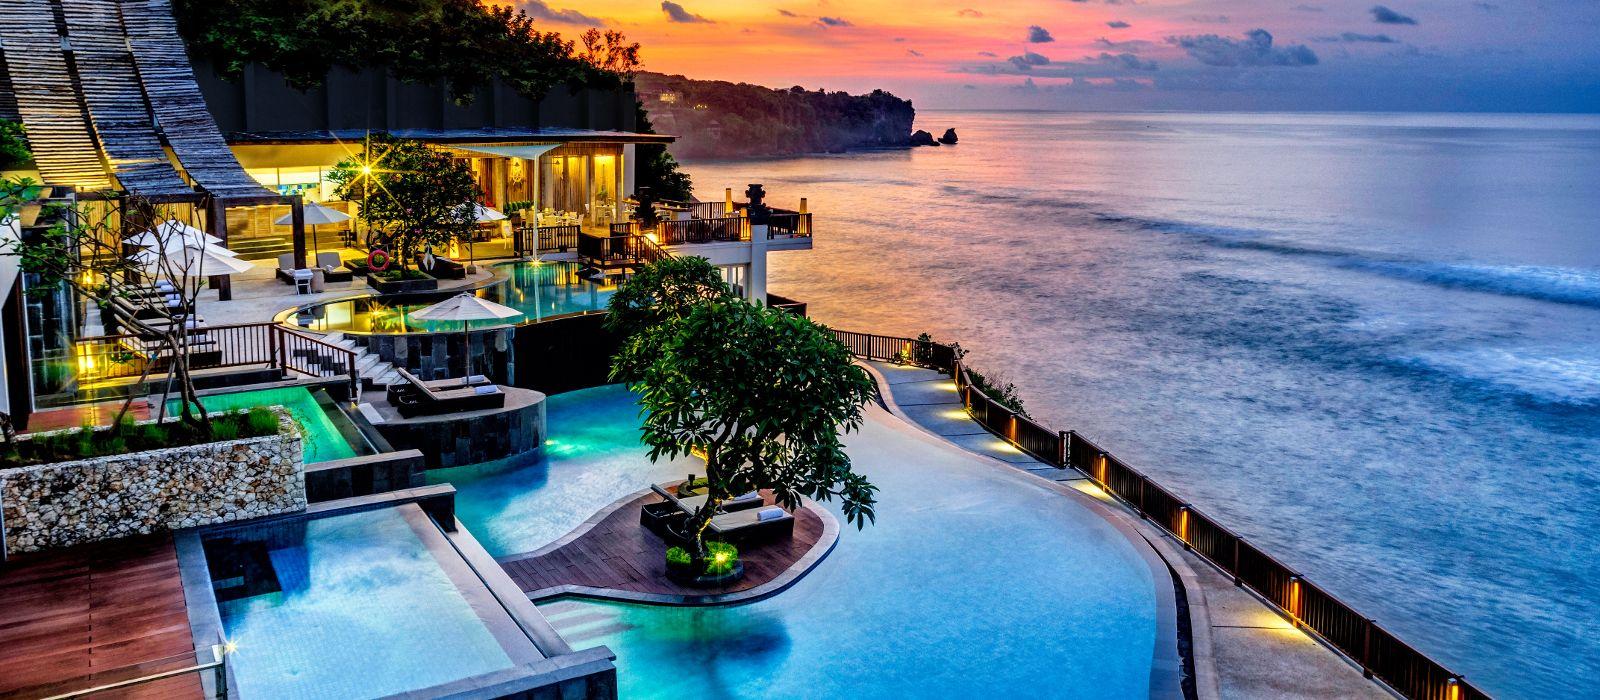 Hotel Anantara Uluwatu Bali Resort Indonesia